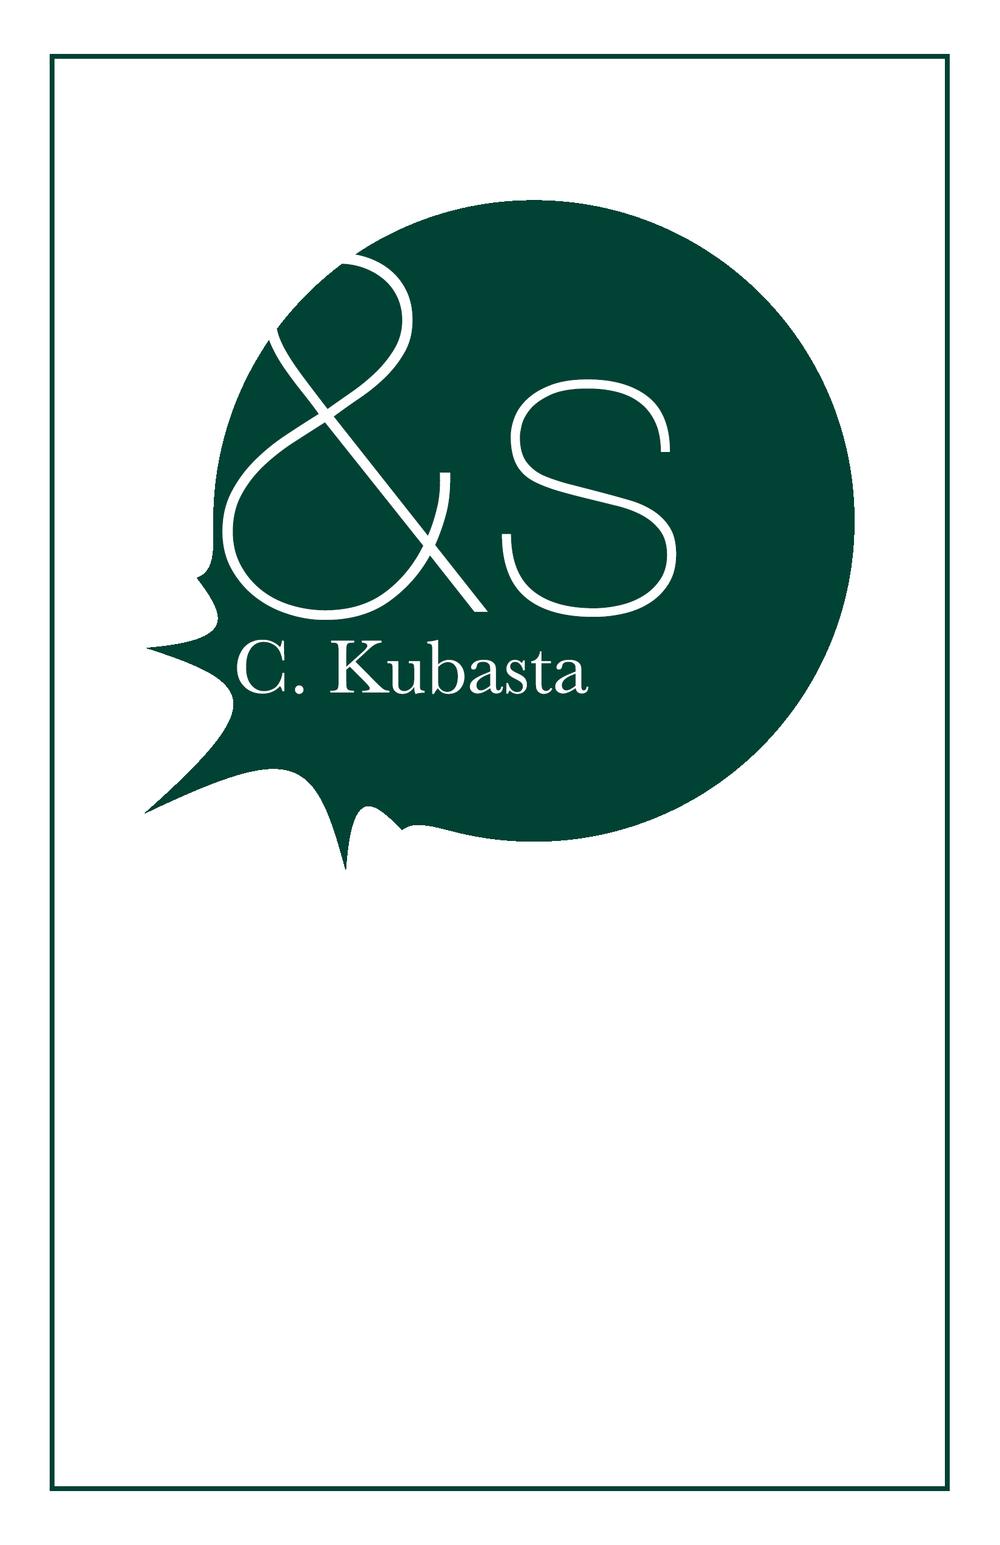 Kubasta_C_COV (2) from flp.jpg